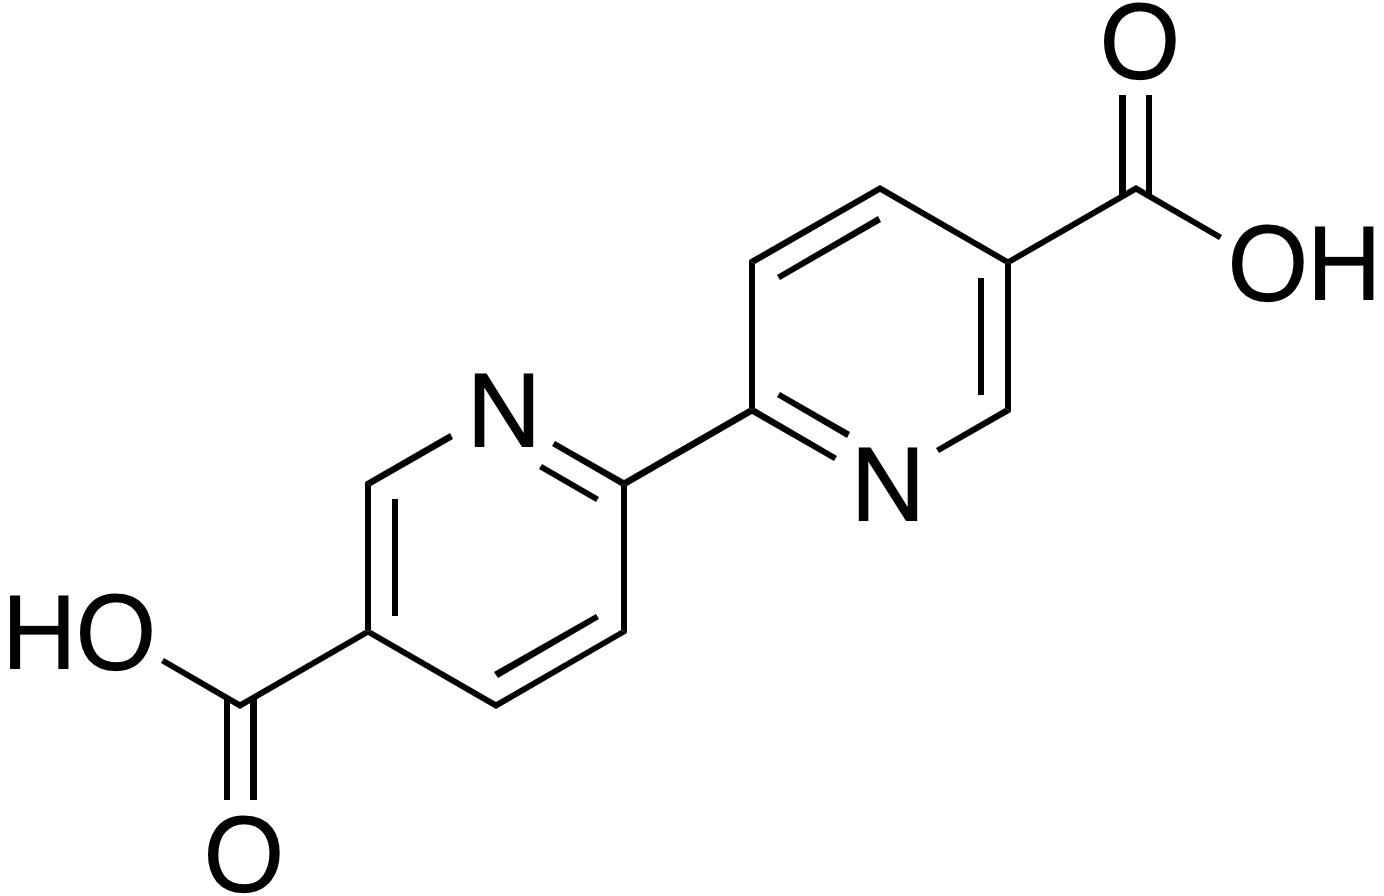 2,2′-Bipyridine-5,5′-dicarboxylic acid